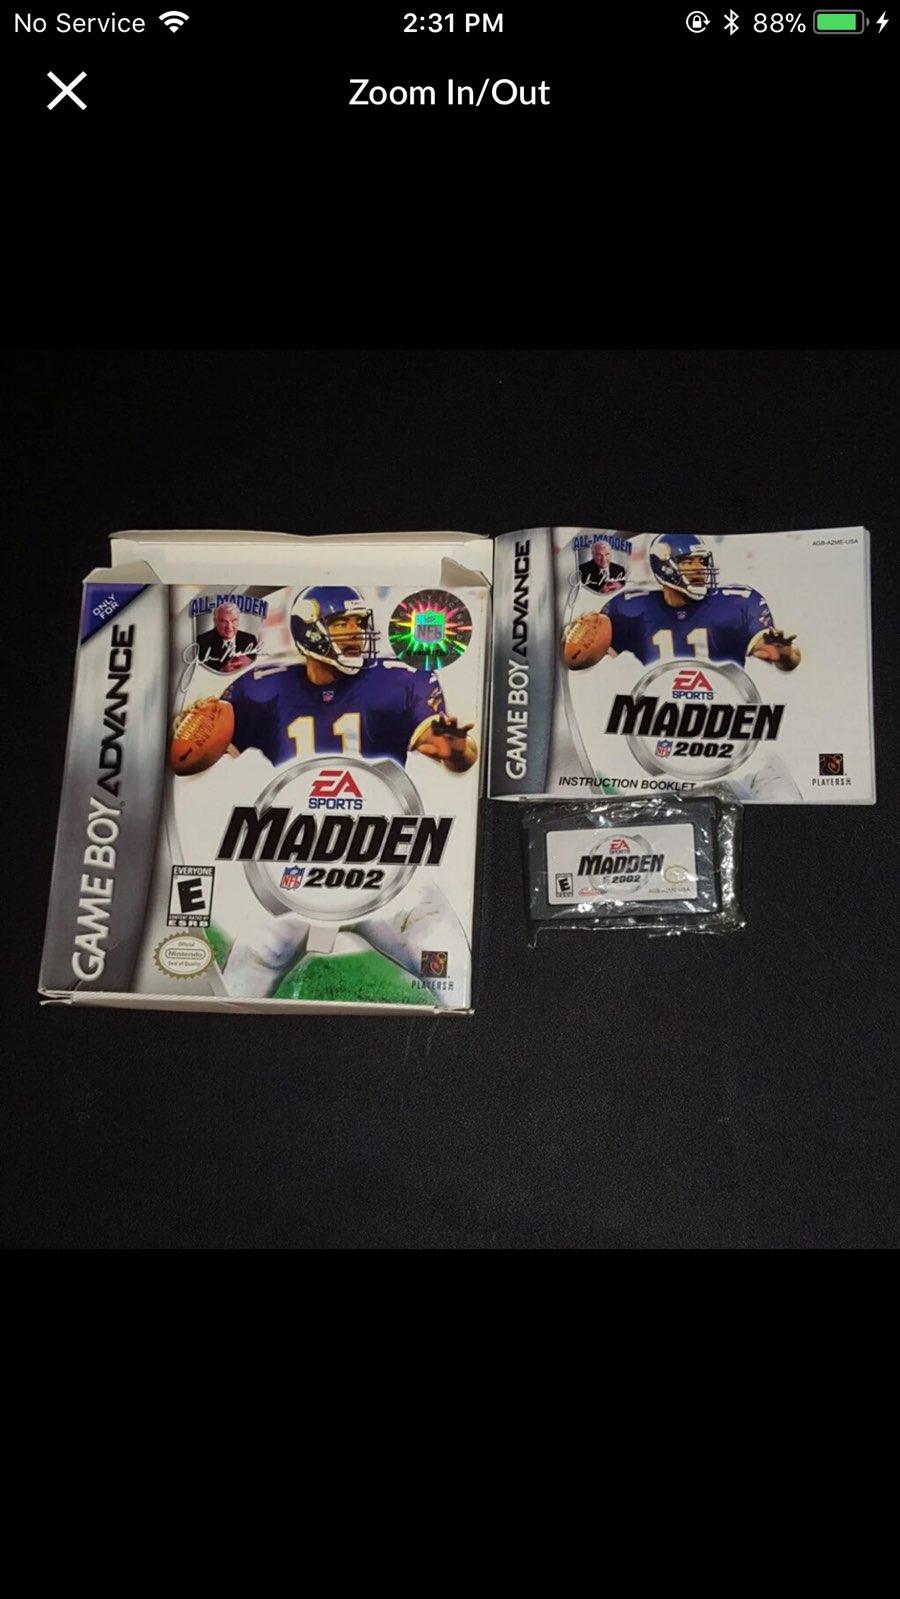 Gameboy Advance Madden 2002